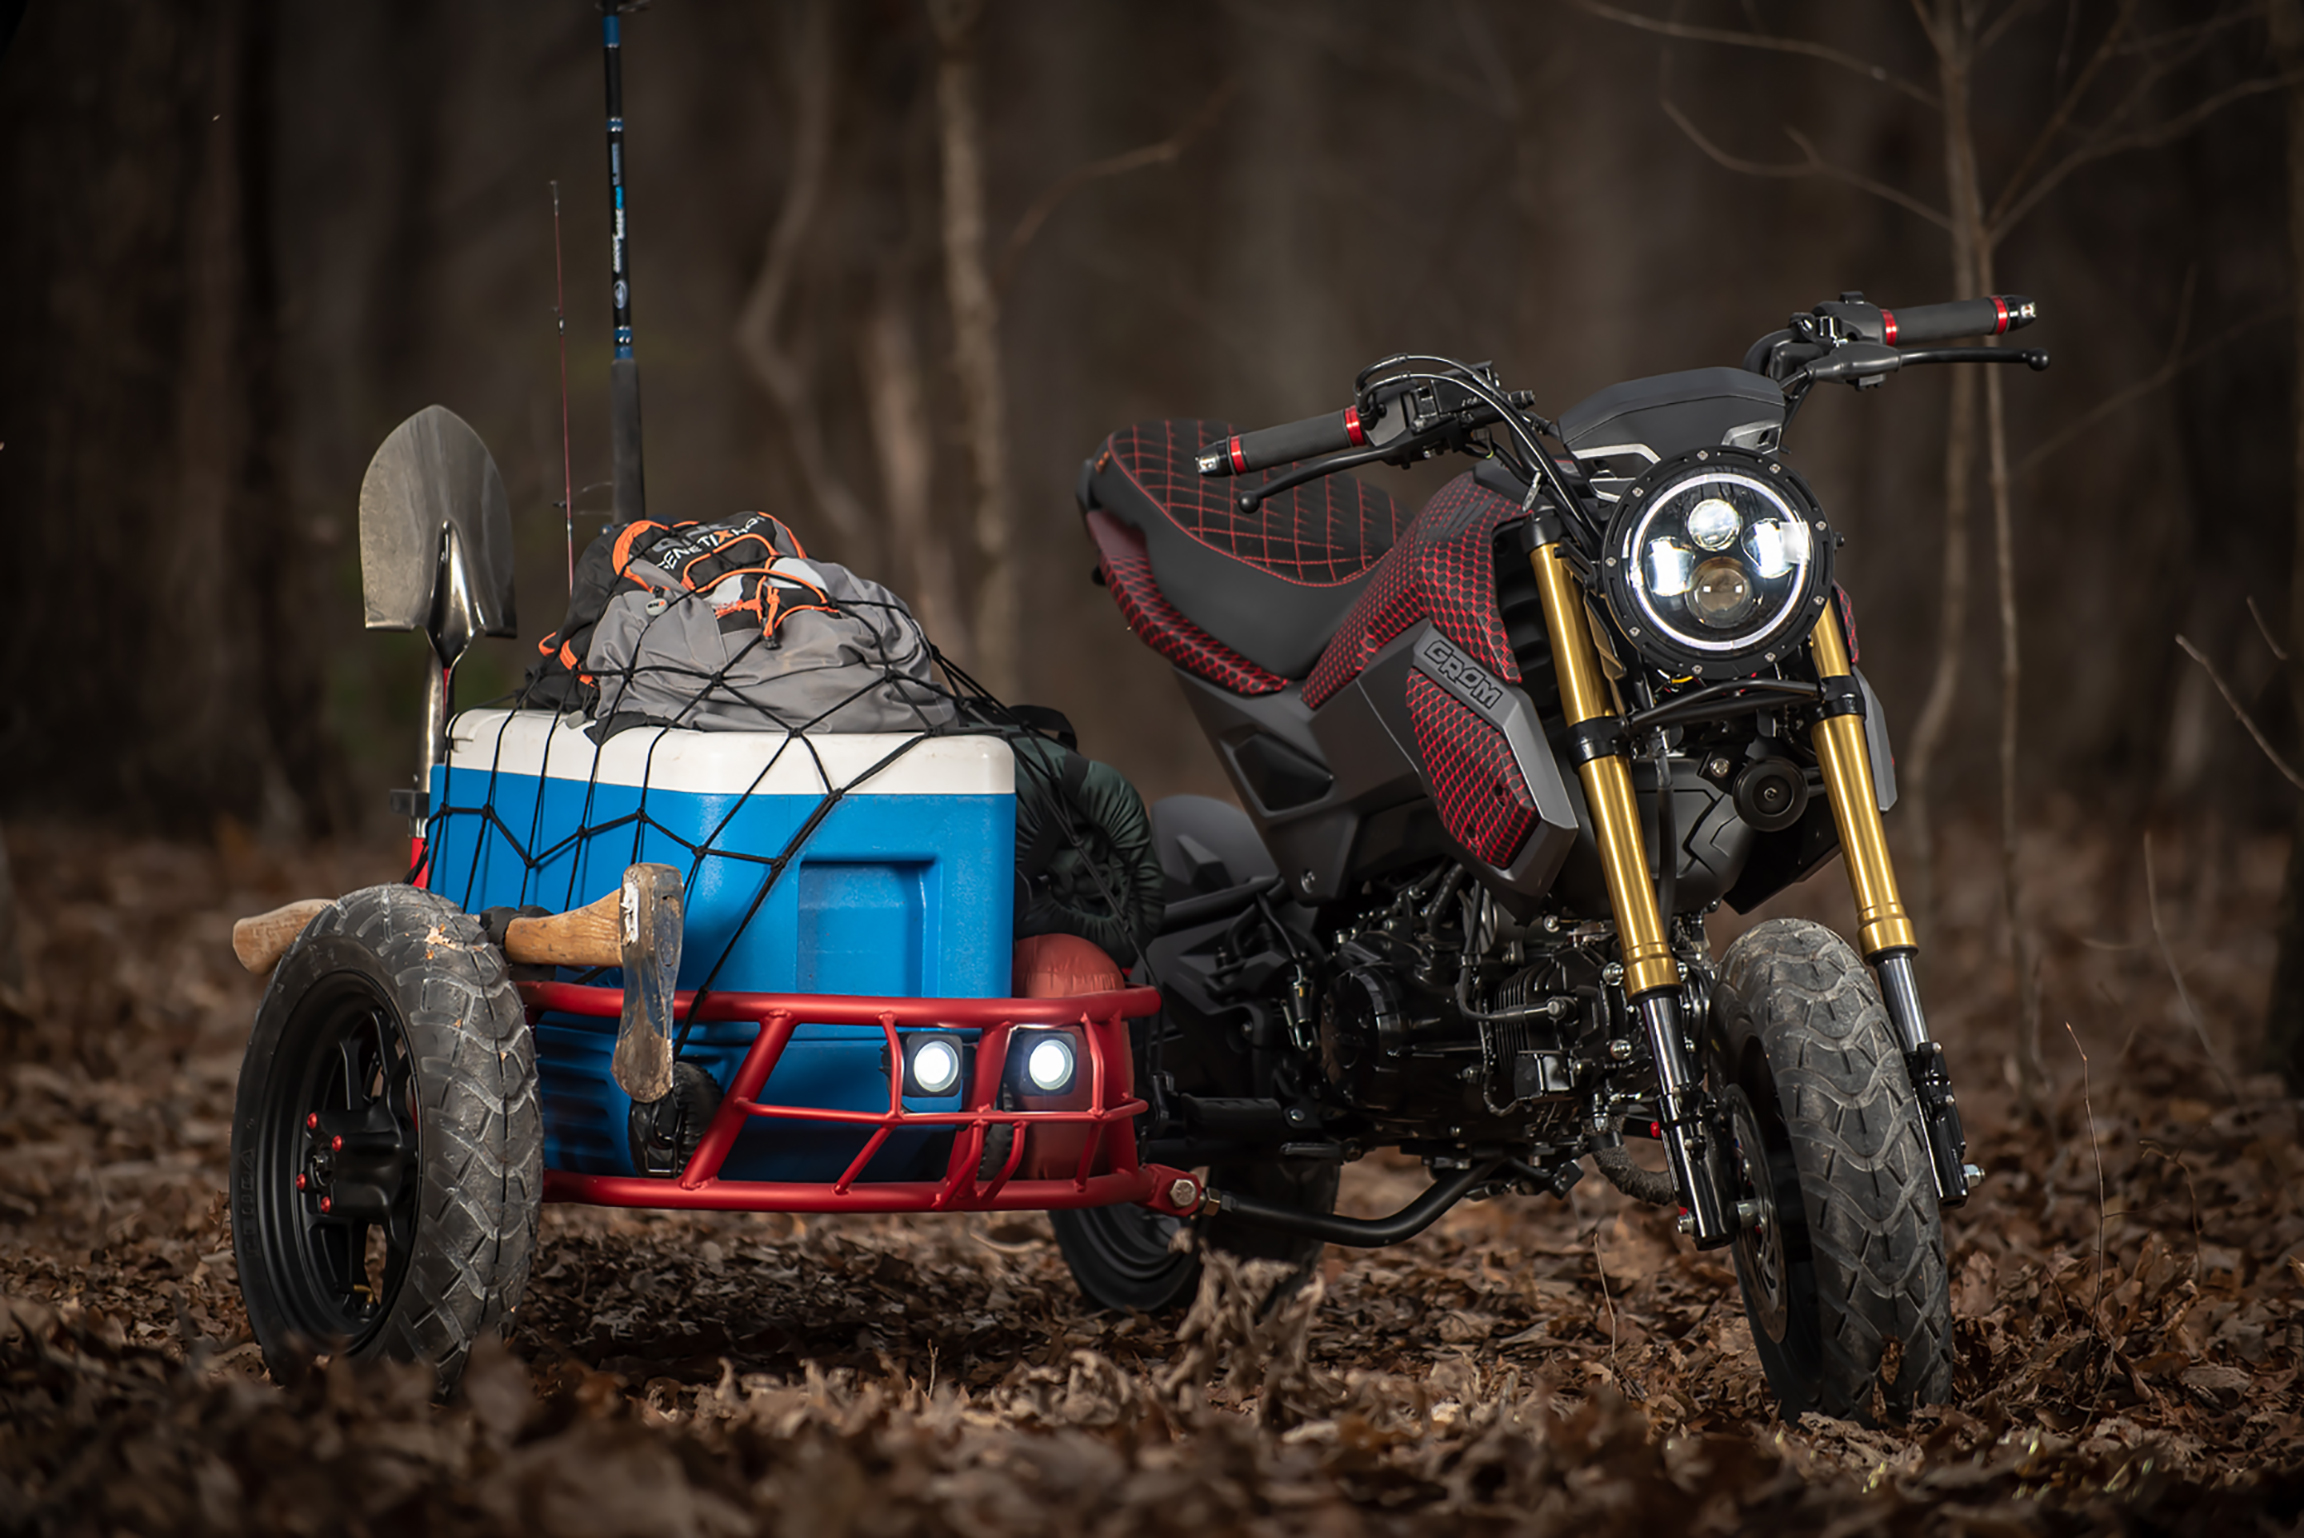 Tiny 'Grom Utility Sidecar' Looks Fun as Hell | GearJunkie